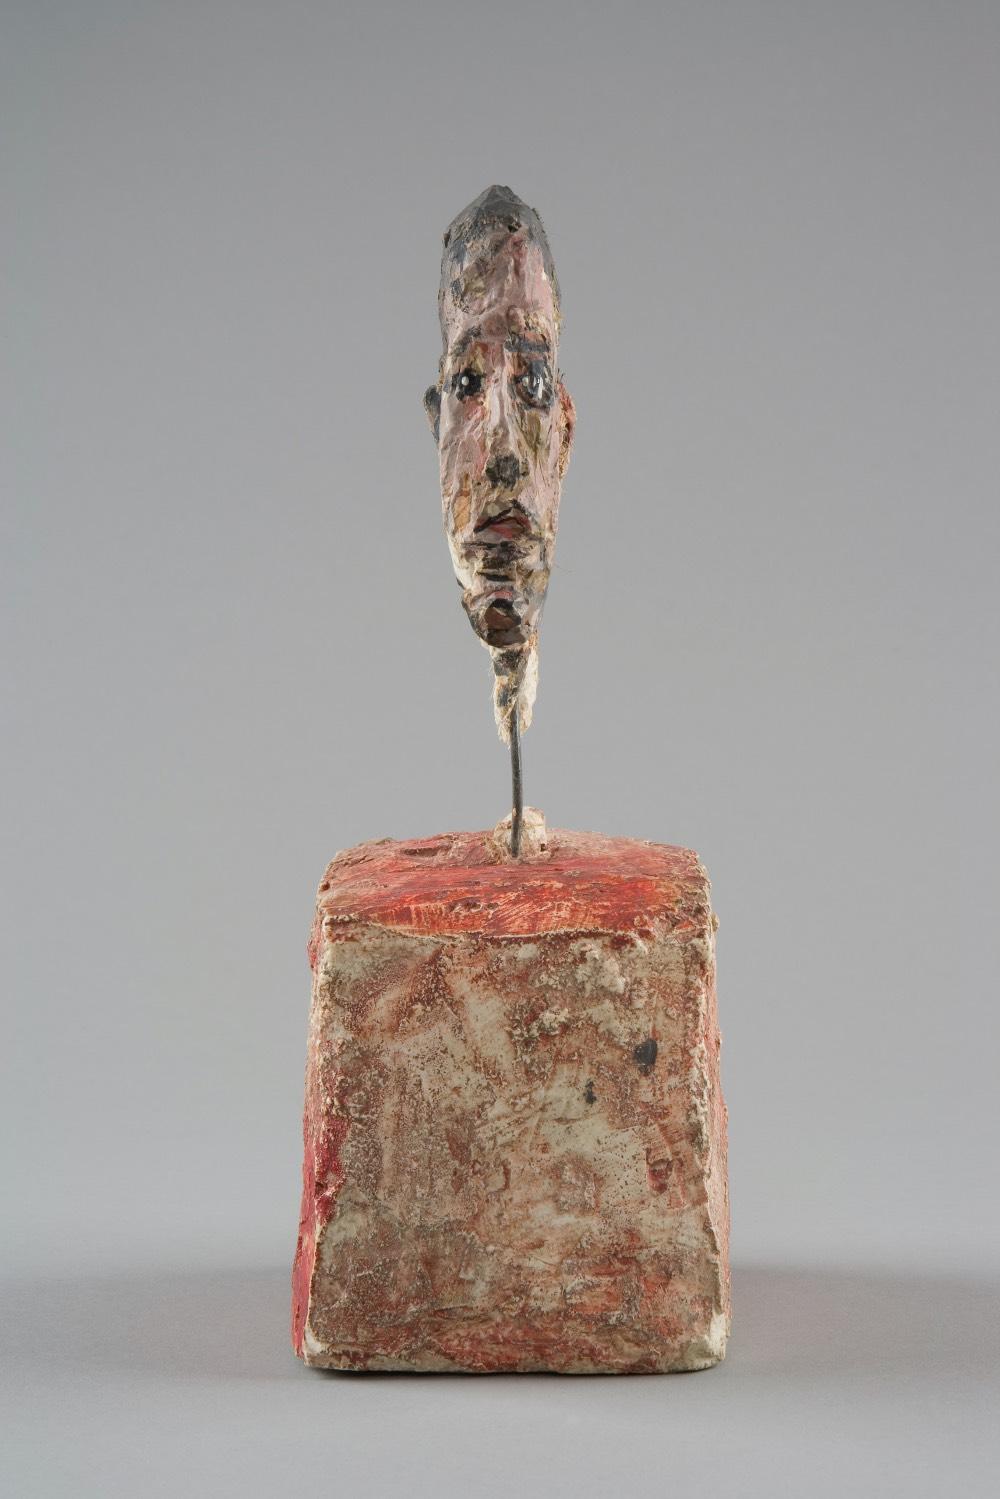 Hlava-muze-na-podstavci-alberto-Giacometti